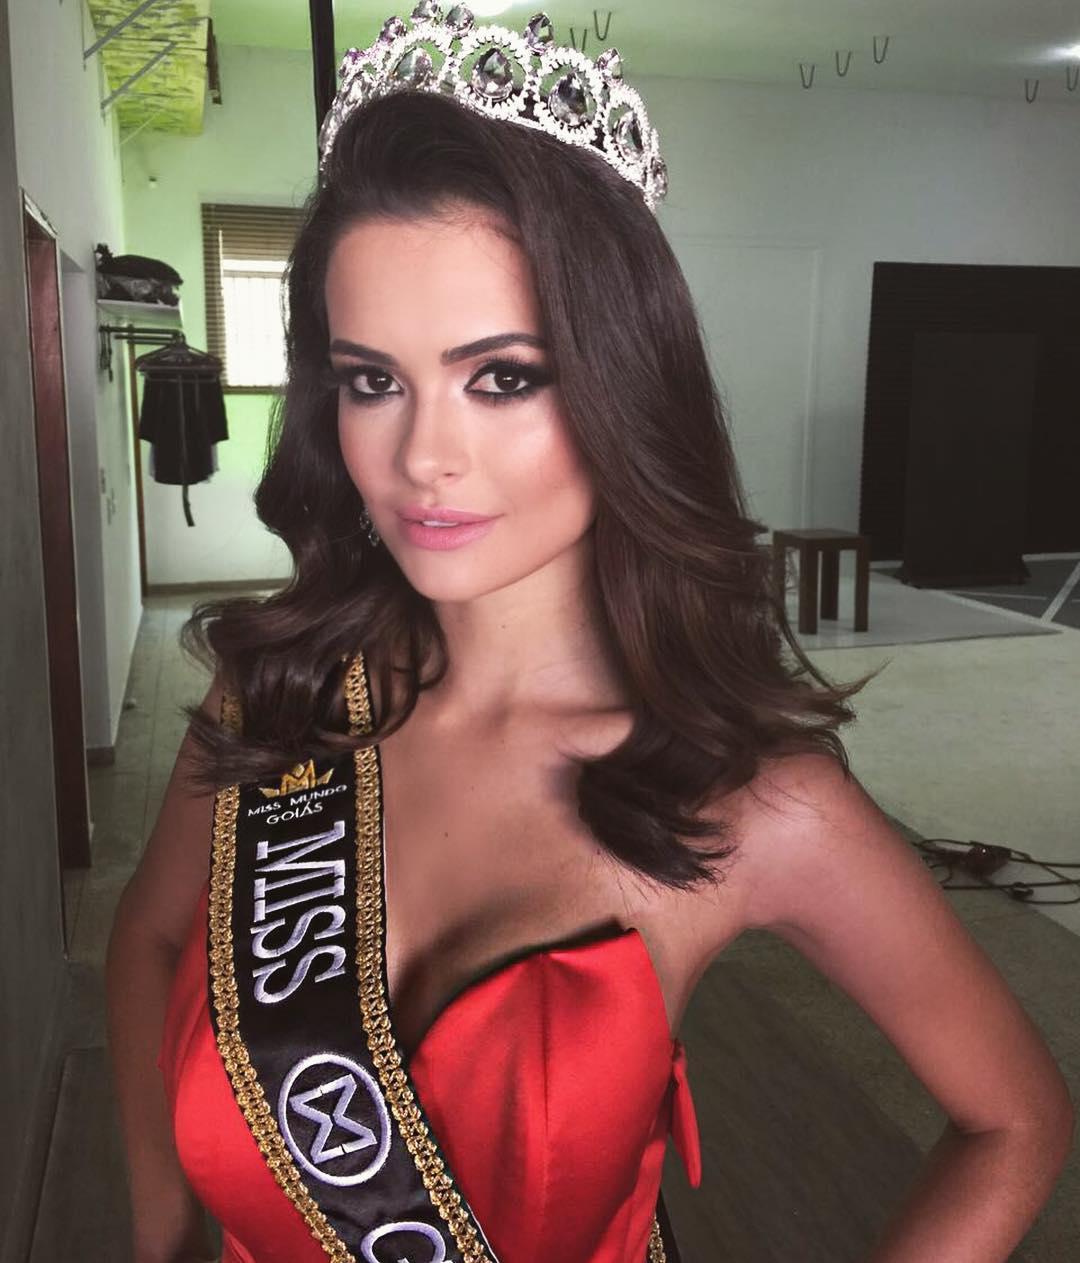 beatrice fontoura, top 10 de miss world 2016. - Página 2 C4yj6dq3